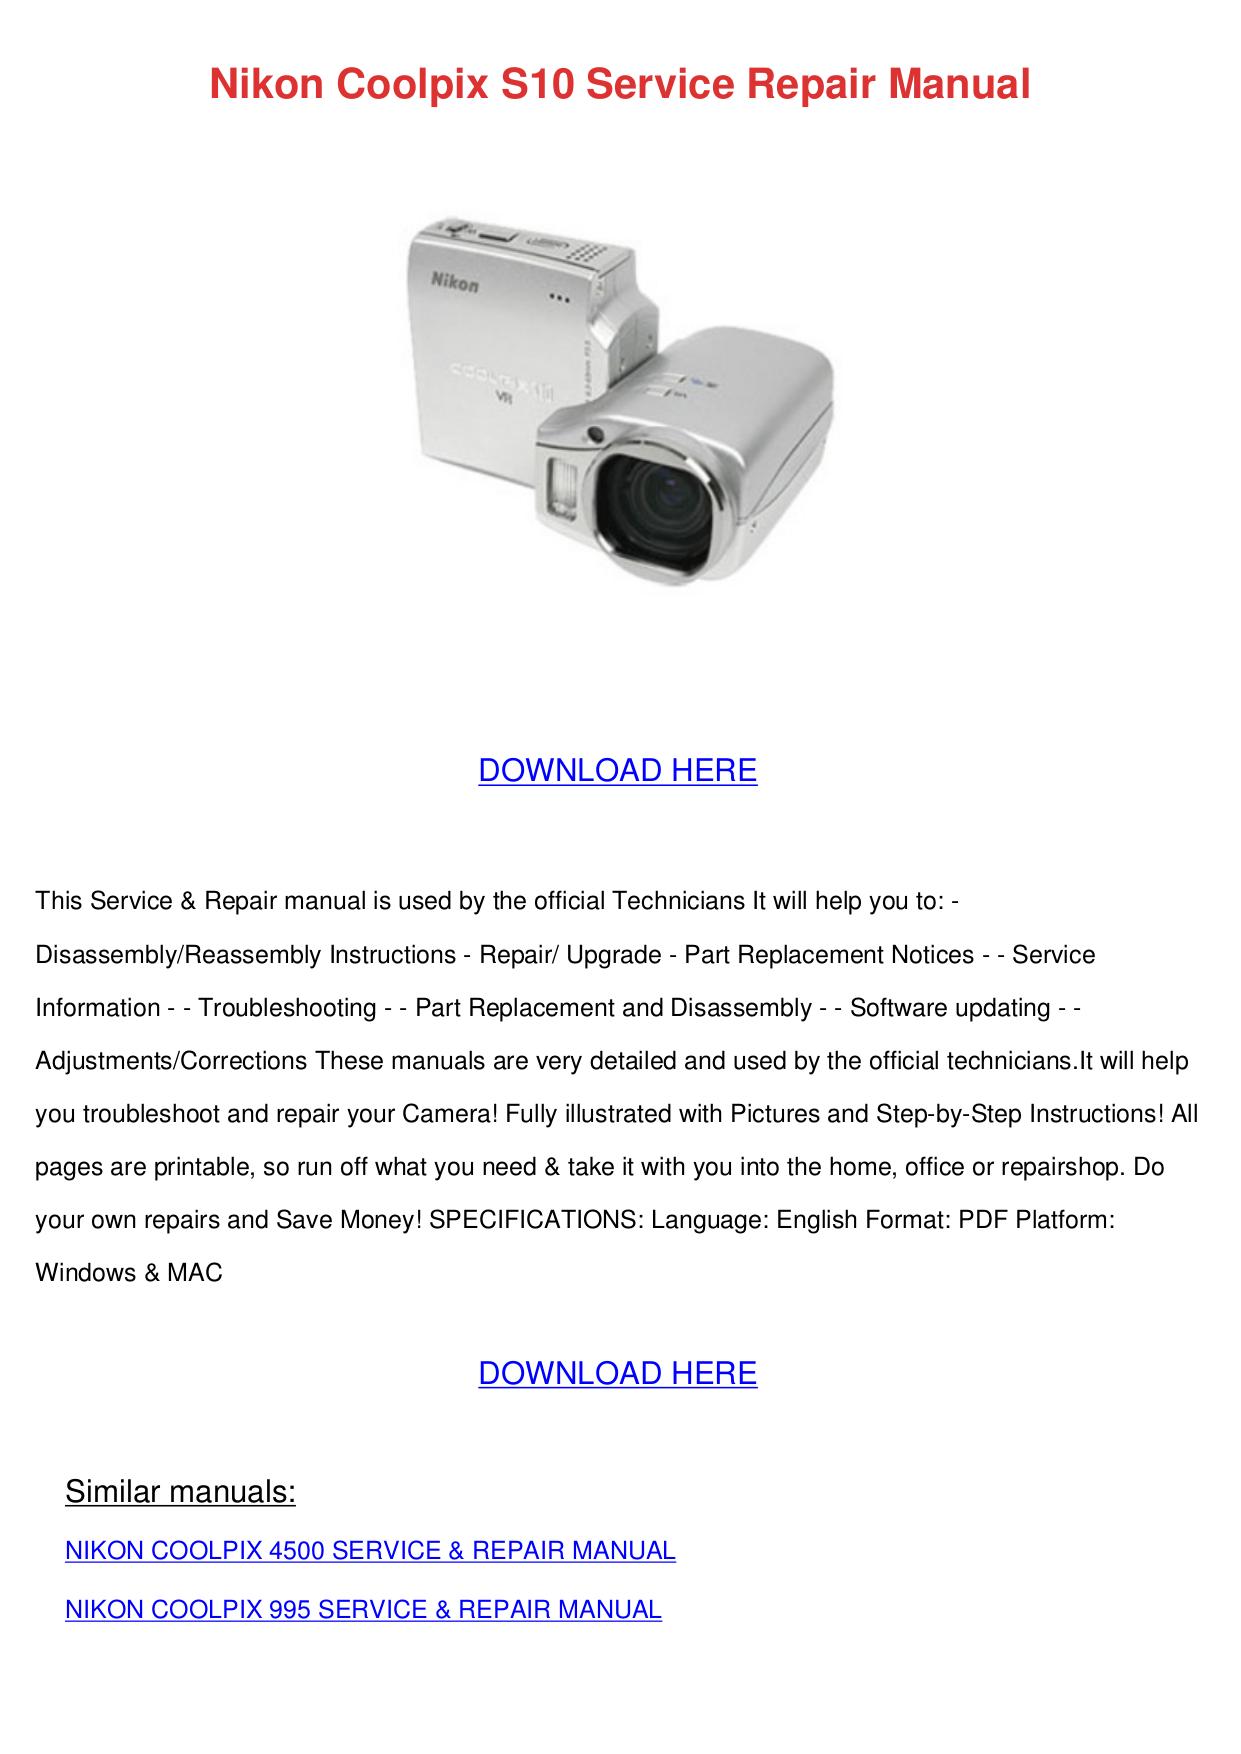 Nikon coolpix s10 camera download instruction manual pdf.